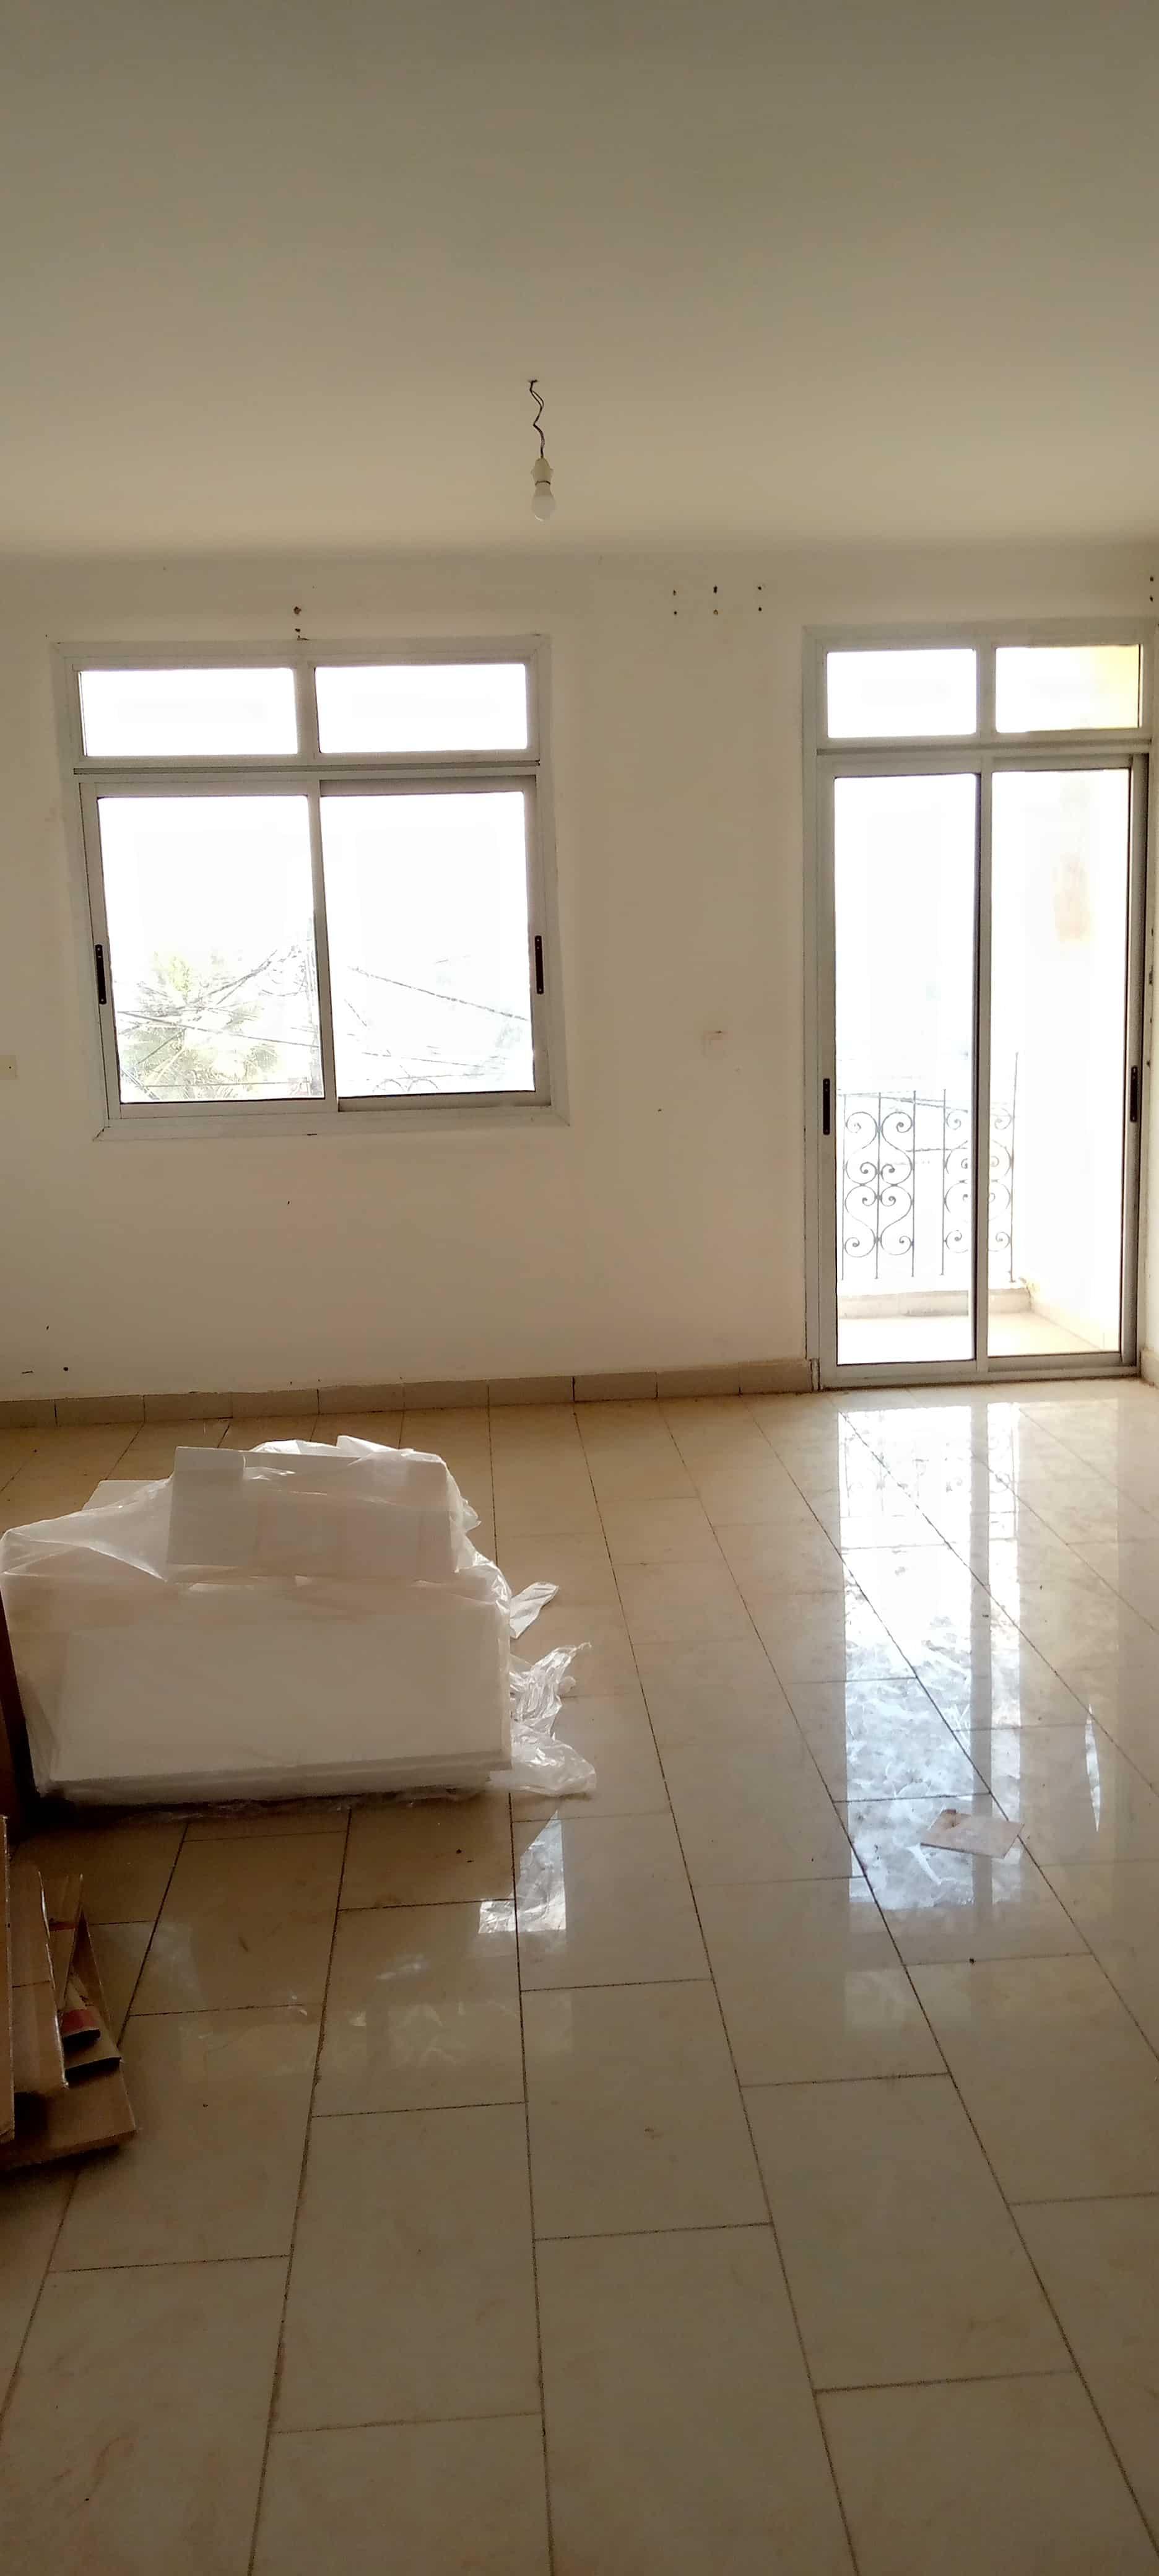 Apartment to rent - Yaoundé, Santa Barbara, Pas loin de la sonel - 1 living room(s), 2 bedroom(s), 2 bathroom(s) - 200 000 FCFA / month